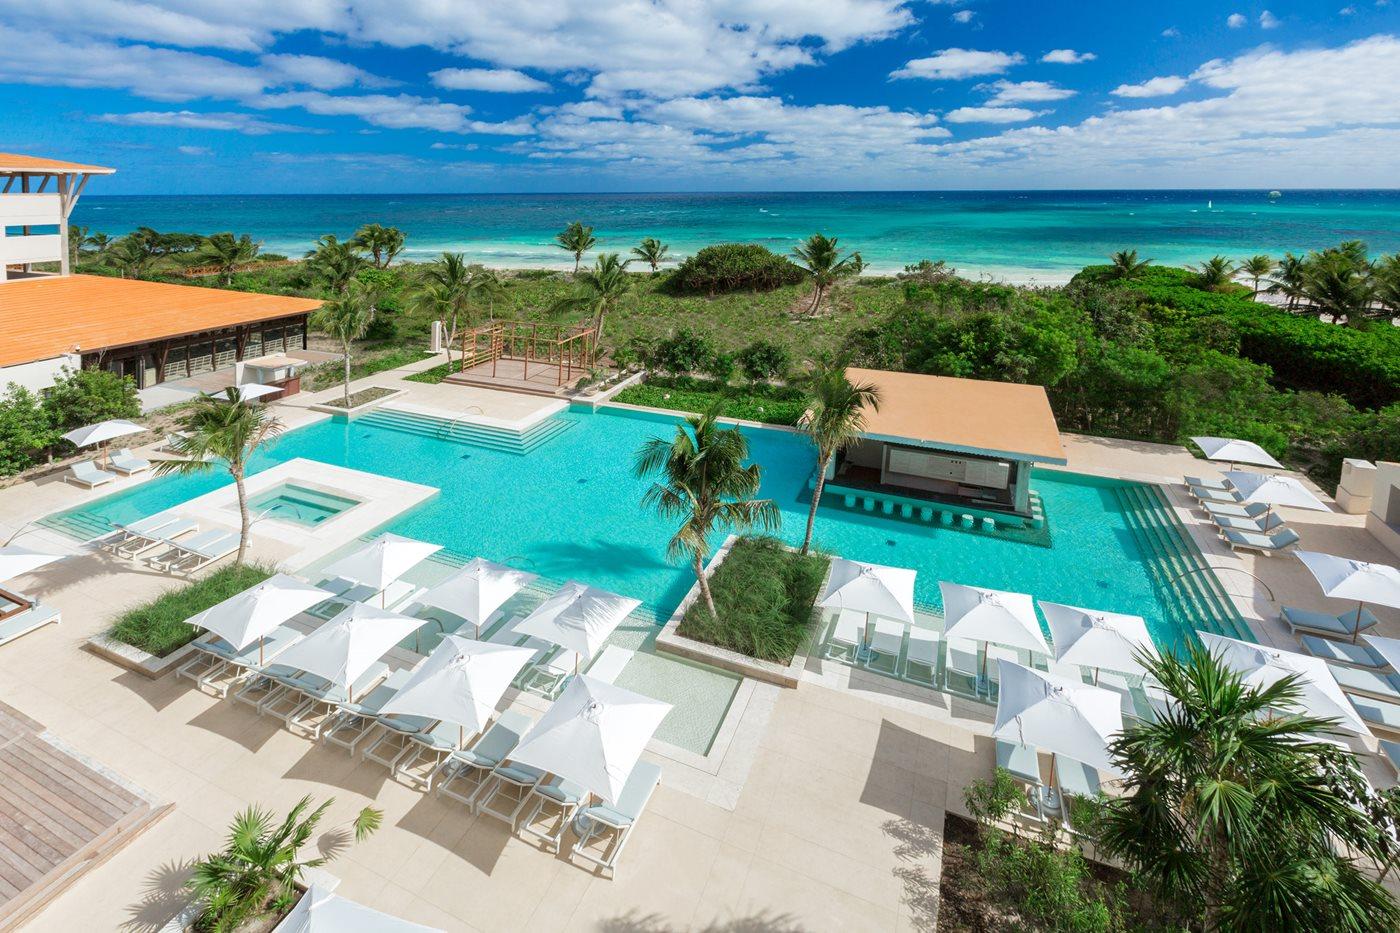 Unico-Riviera-Maya-Pool-002-AR